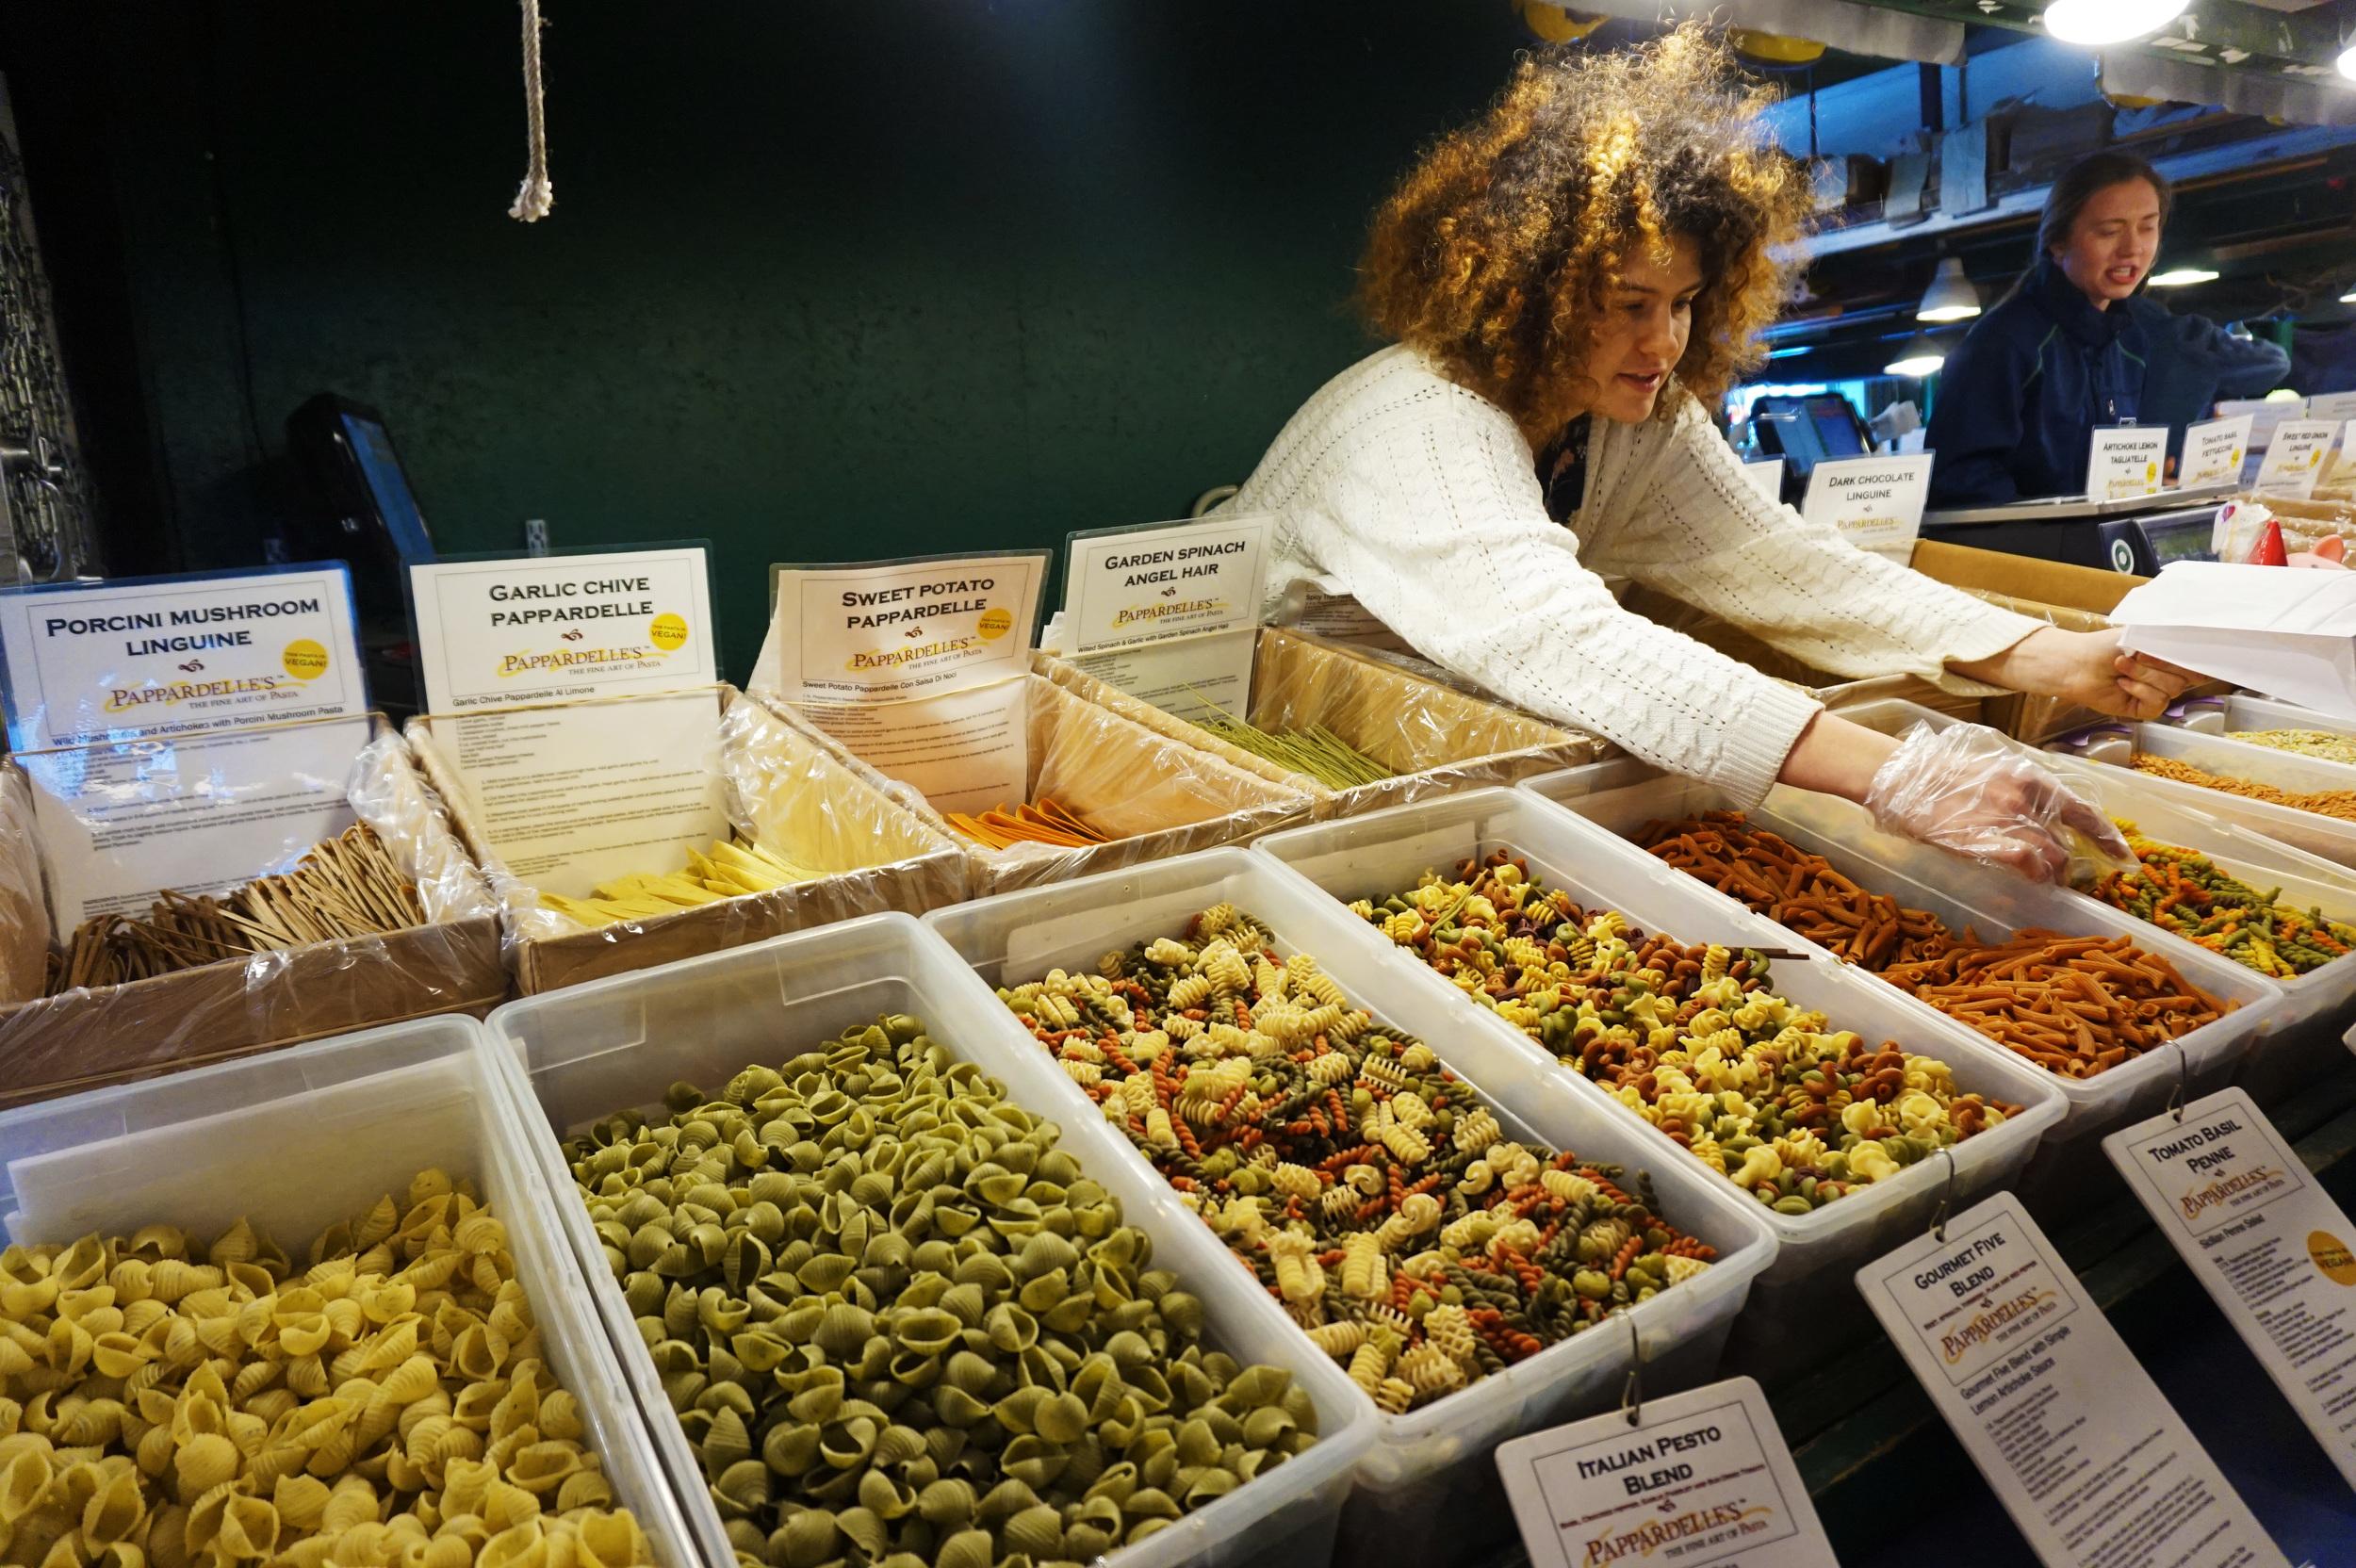 My idea of heaven: unlimited pasta